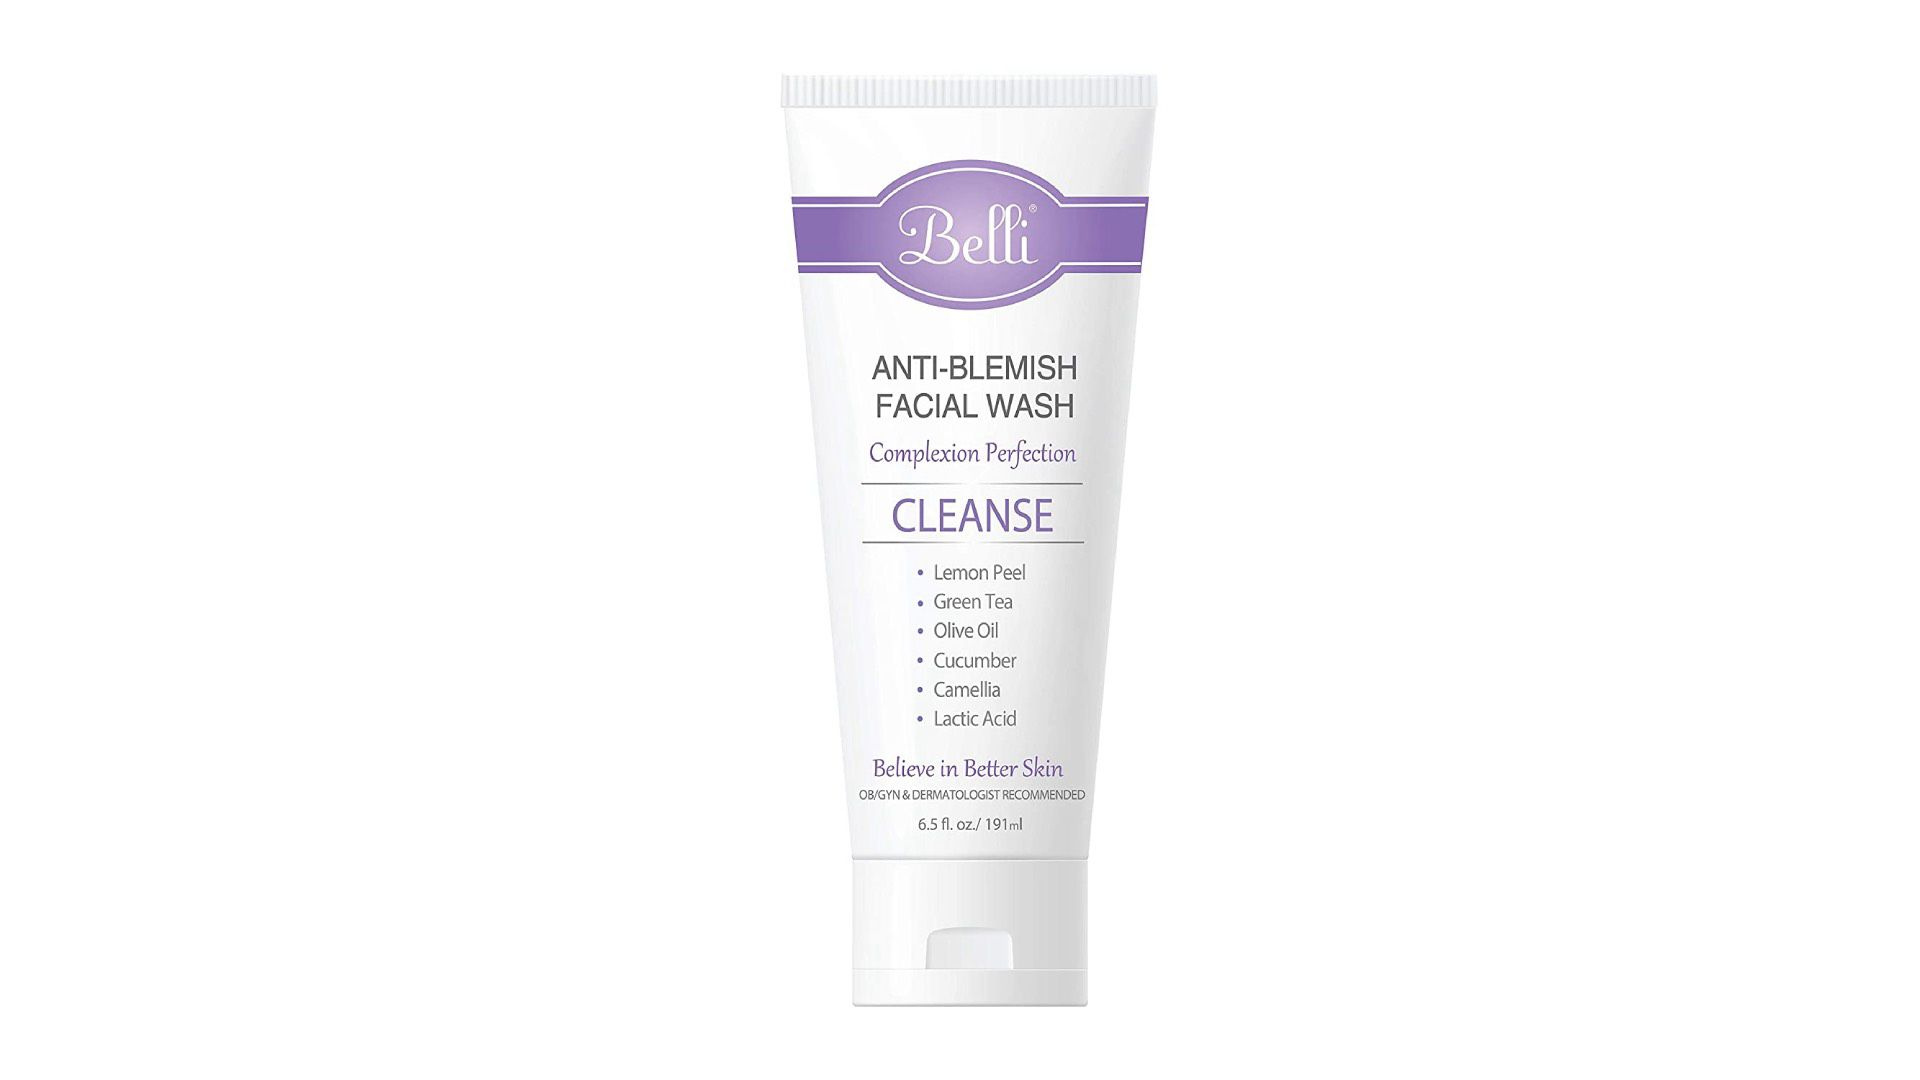 Belli anti-blemish wash